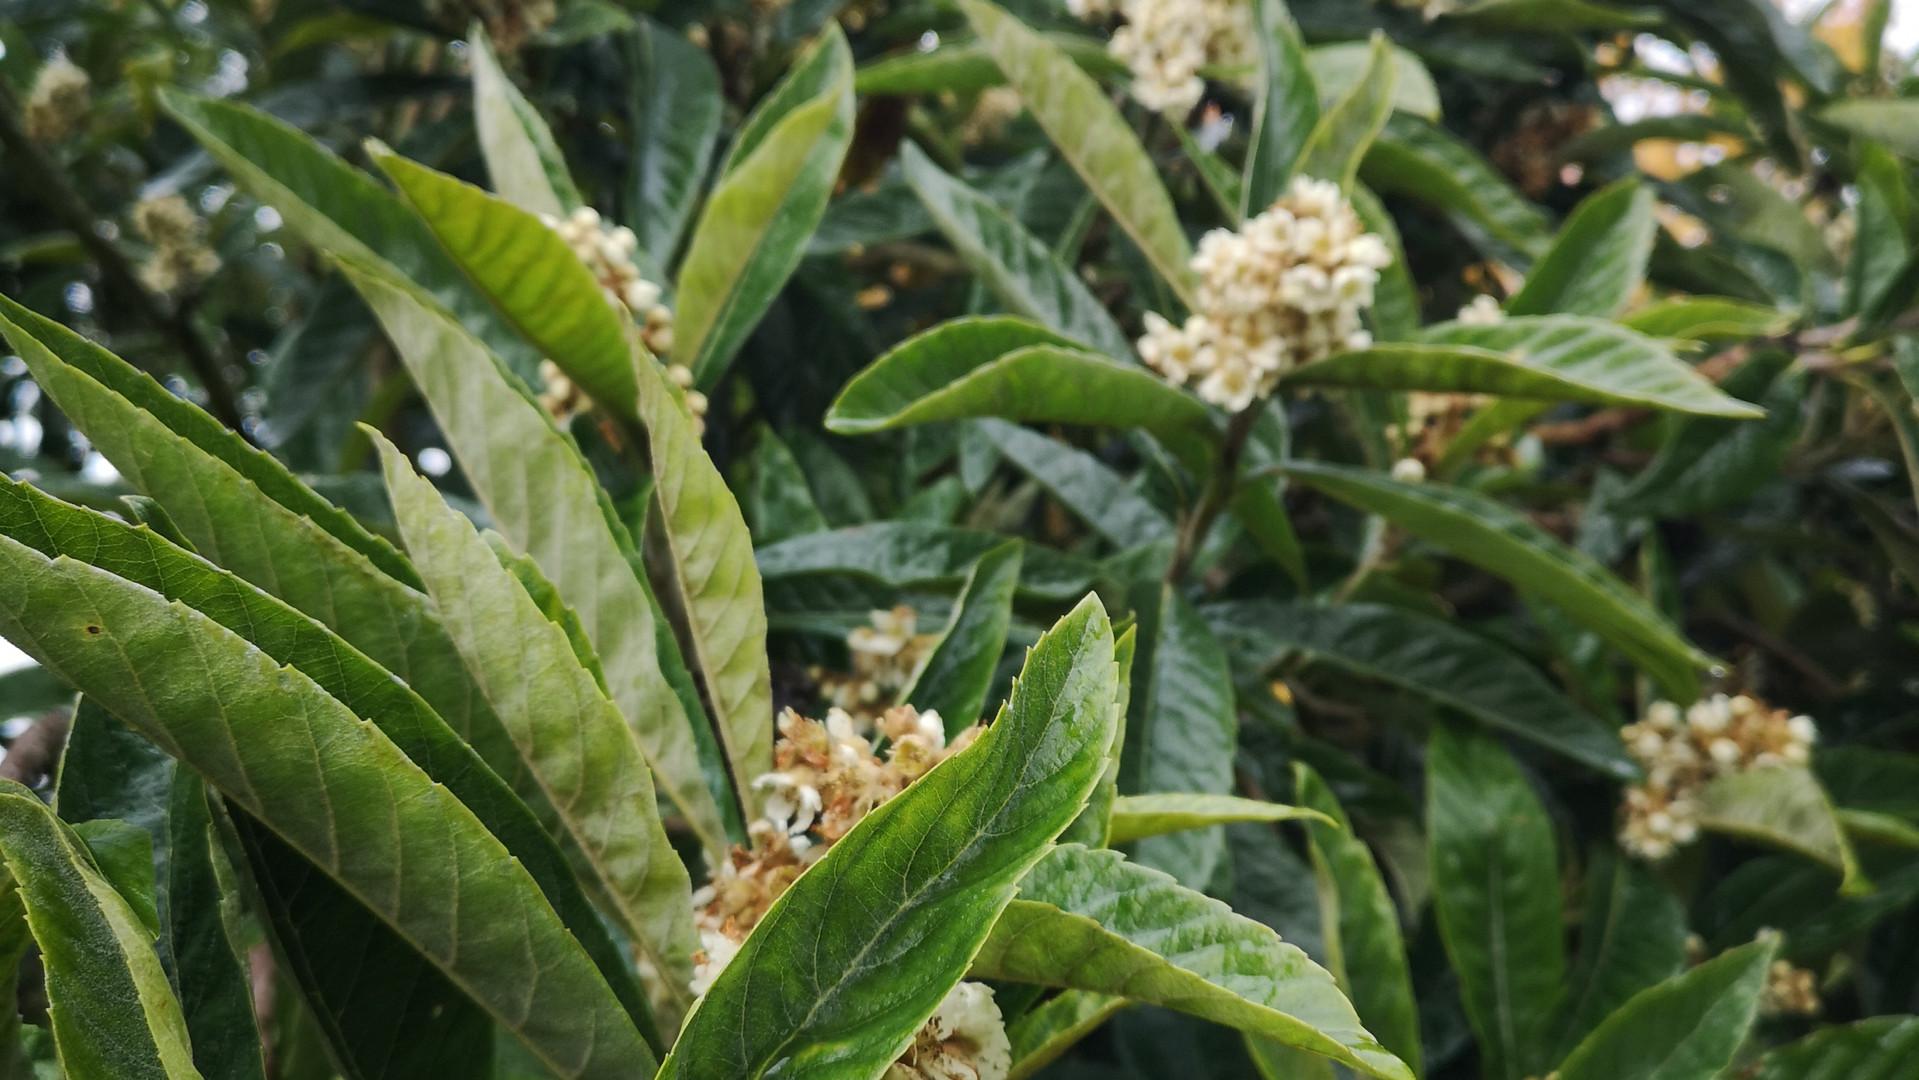 69-eriobotrya japonica.jpg